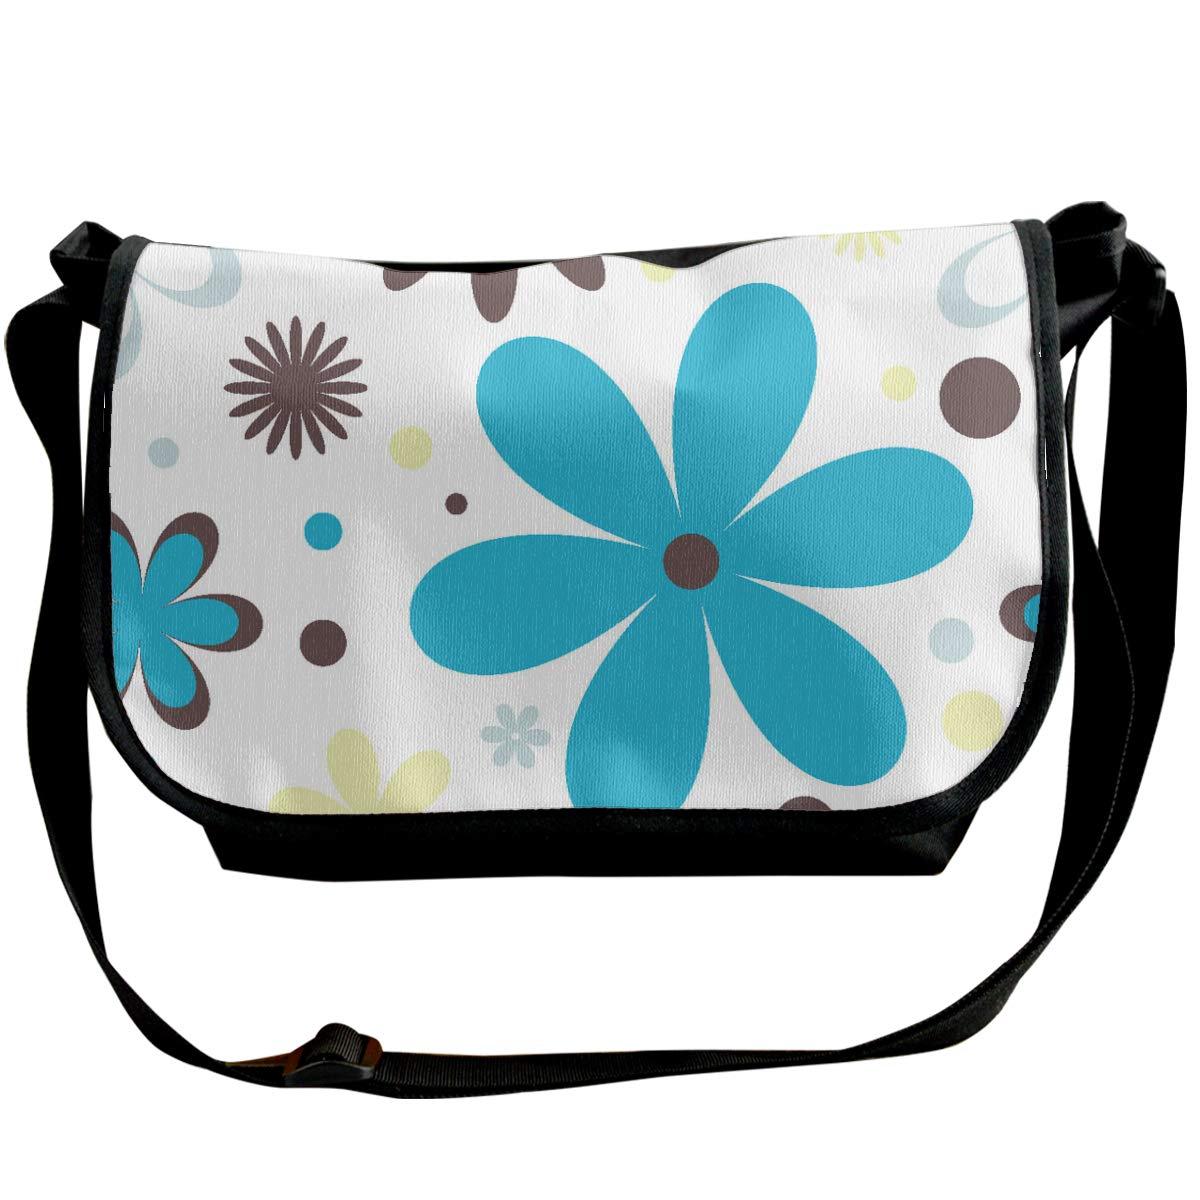 XIANGXIANG SHOP Cartoon Background Fashion Unisex Casual Popular Outdoor Sling Bag Messenger Bag Shoulder Bag